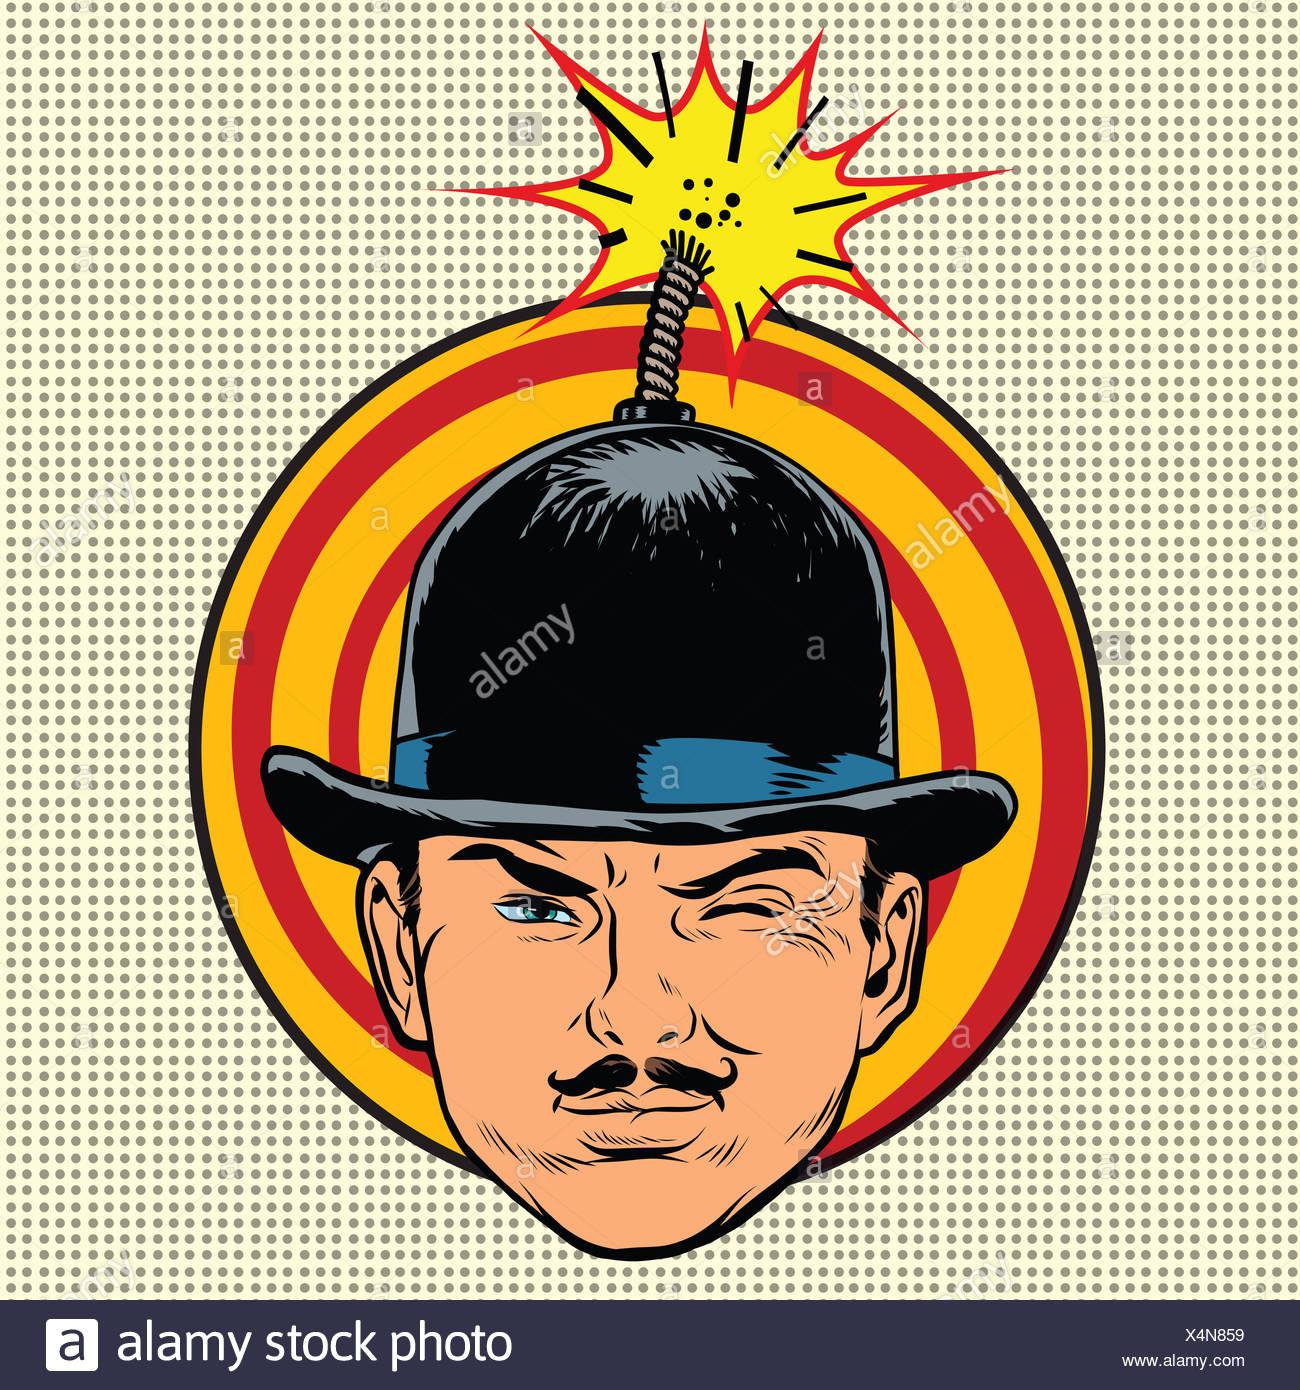 Terrorist Spy Photo >> Spy Terrorist In The Hat Bomb Wick Stock Photo 278291925 Alamy